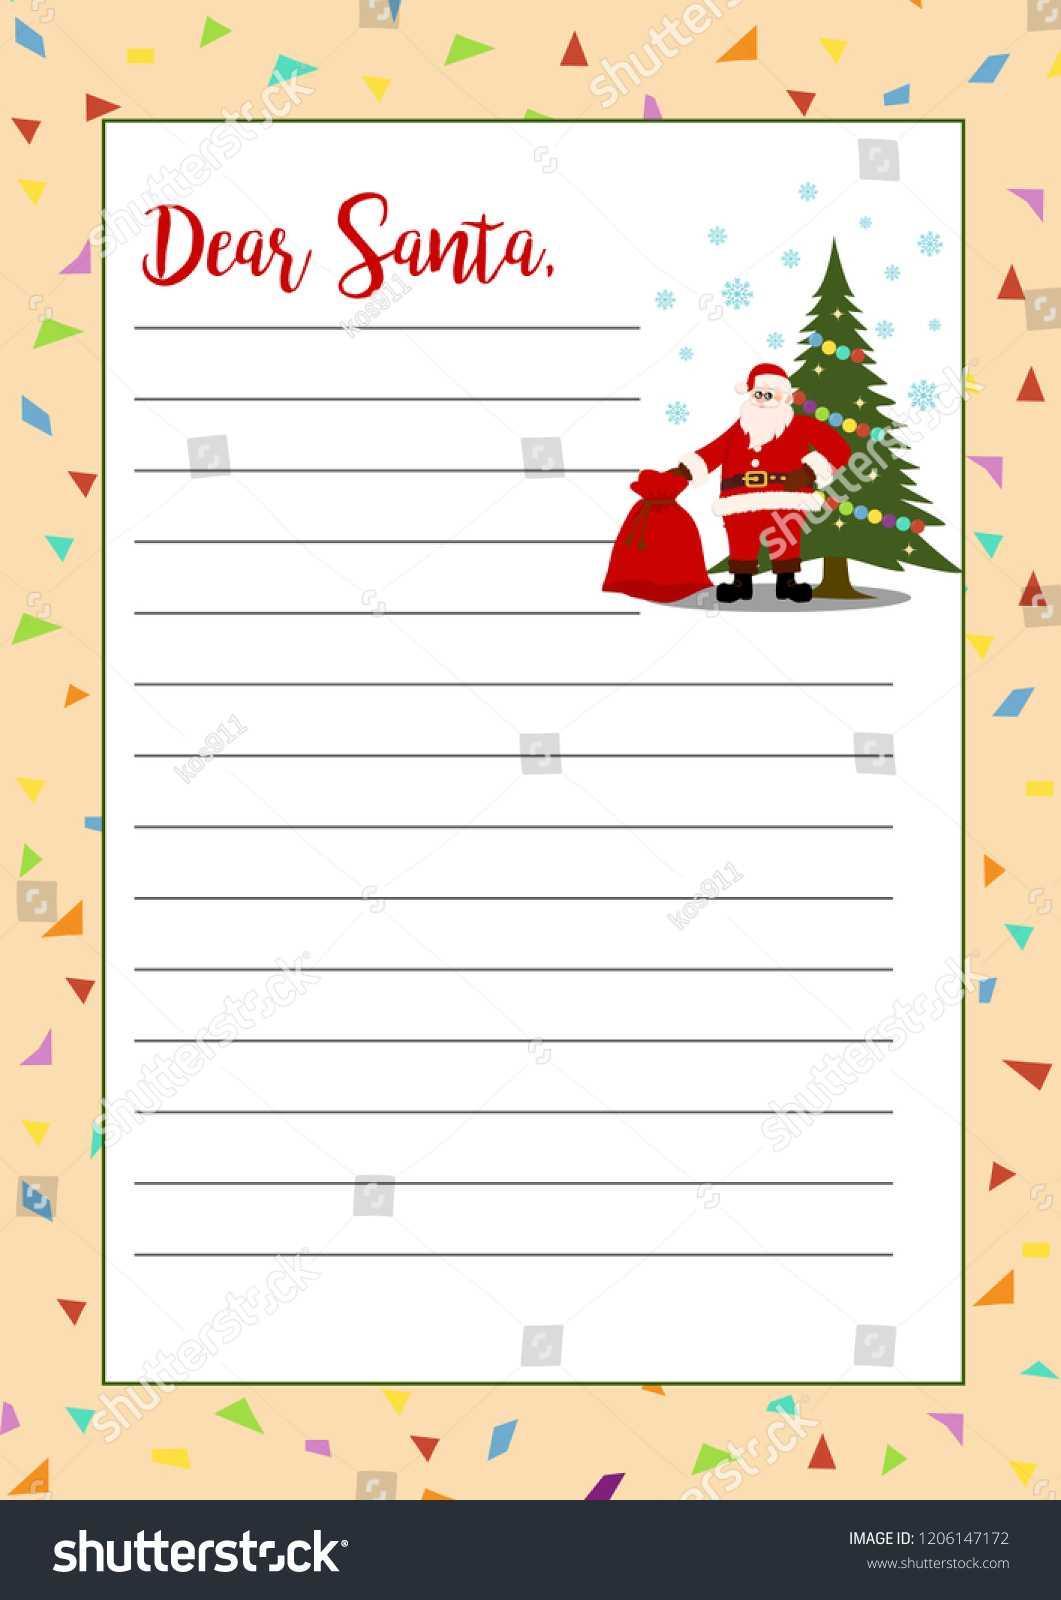 Стоковая Векторная Графика «Christmas Letter Santa Claus In Christmas Note Card Templates